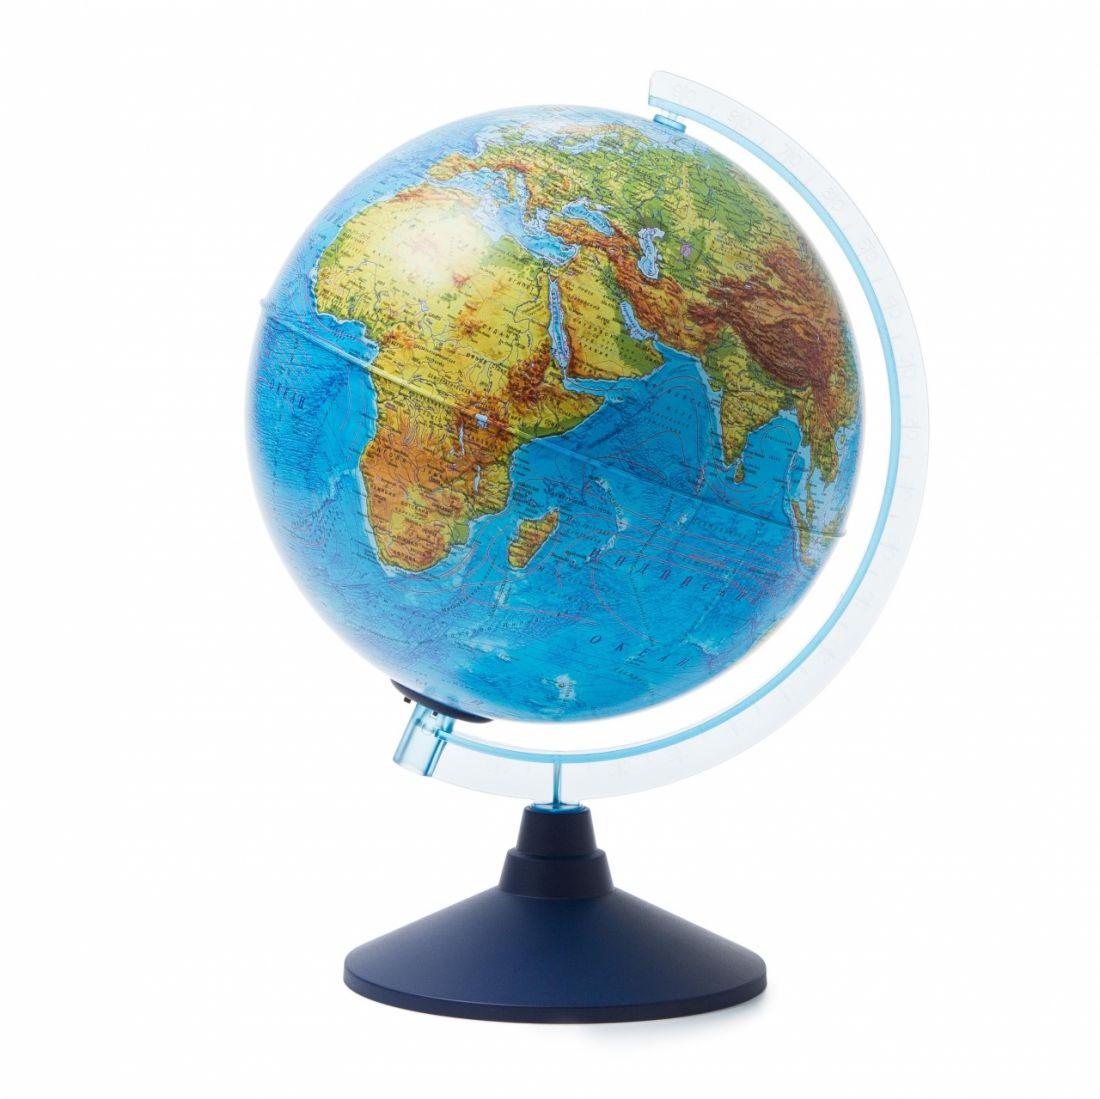 Глобус GLOBEN Ве012500257 Физико-политический (батарейки) 250 Классик Евро